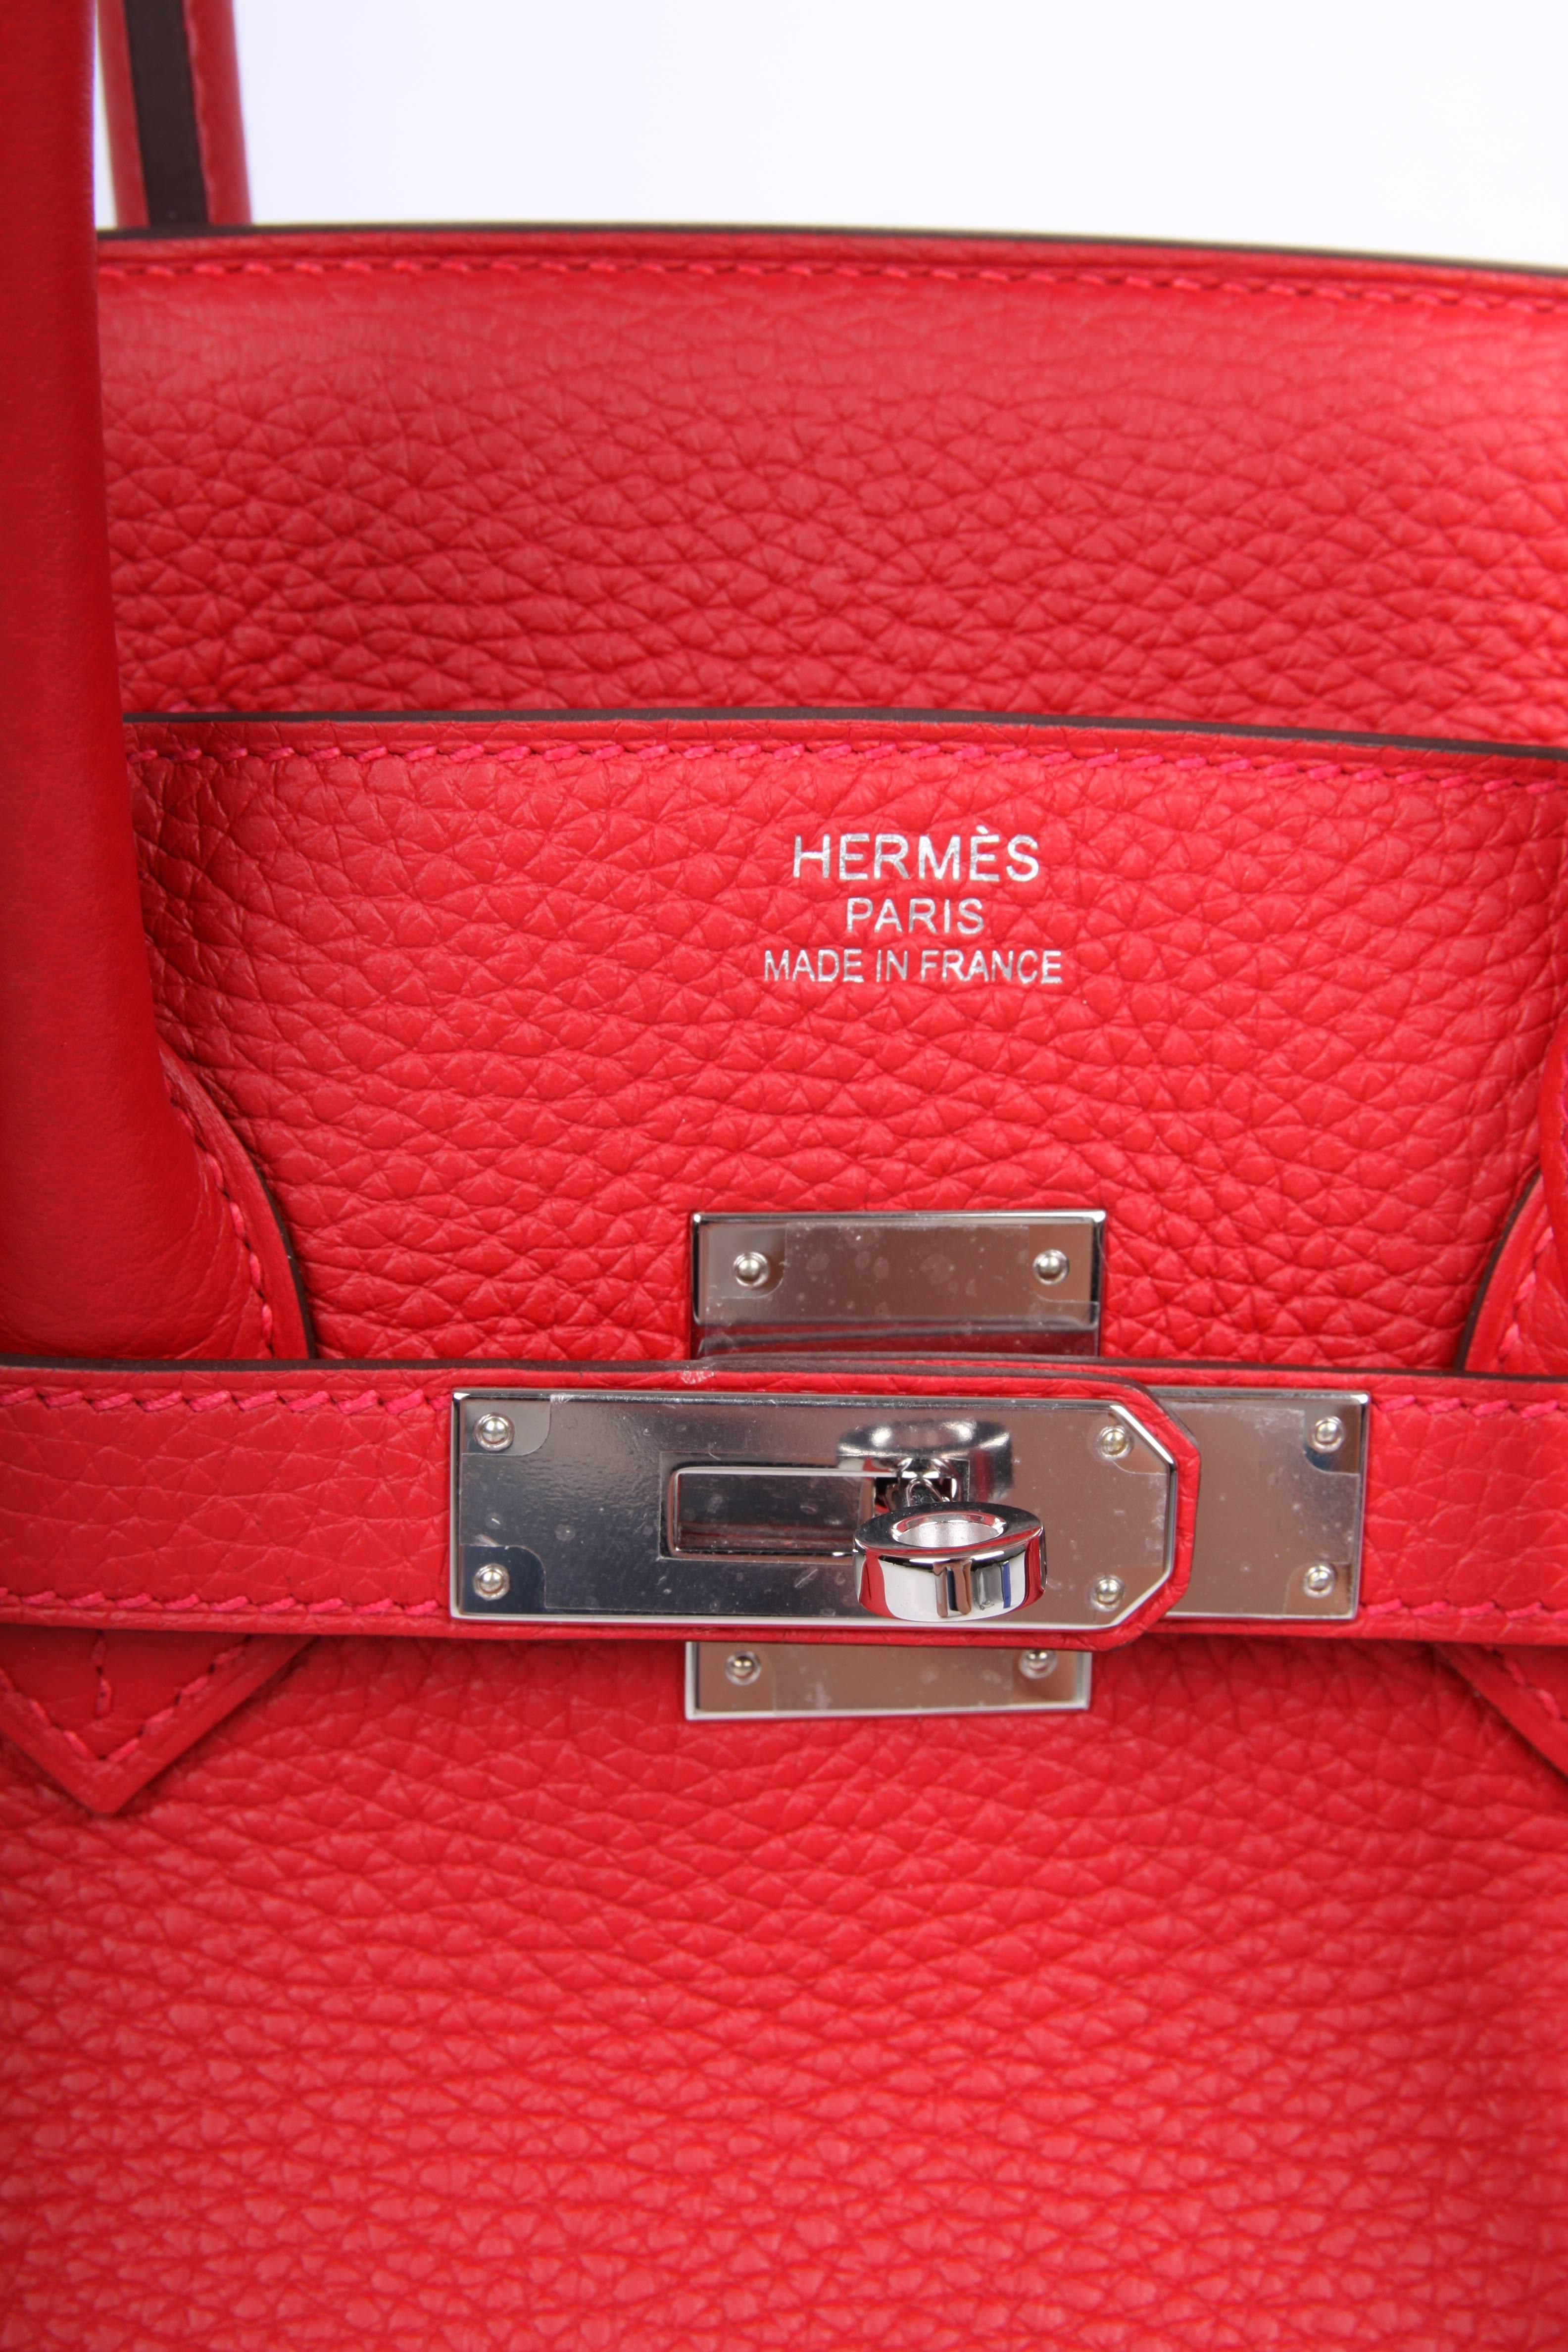 815d593316 ... reduced hermes birkin bag 35 taurillon clemence rouge casaque  silvertone hardware 2017 for sale 1 2e7ea ...